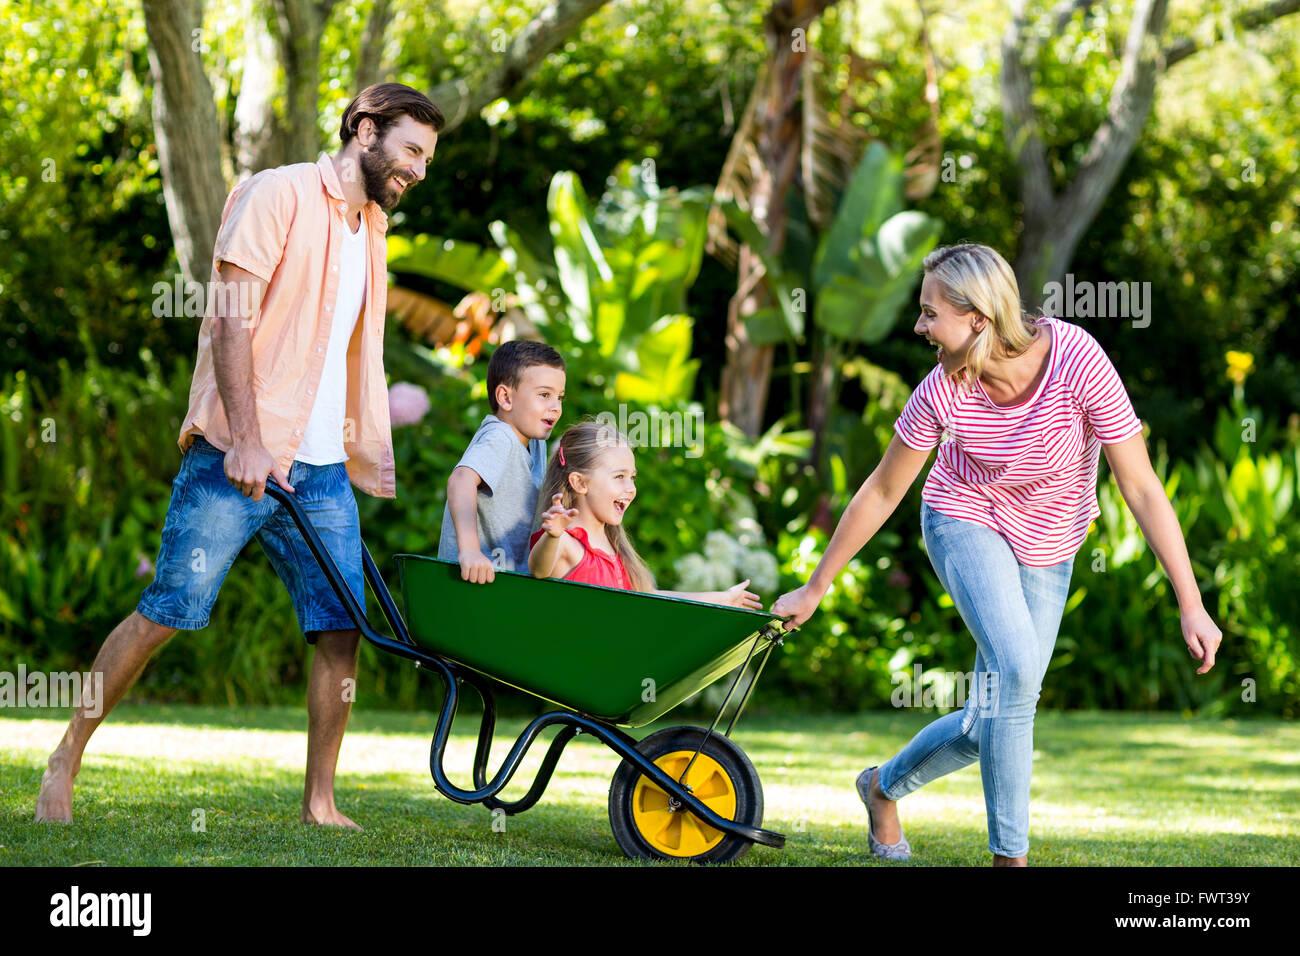 Parents pushing children sitting in wheelbarrow at yard Stock Photo